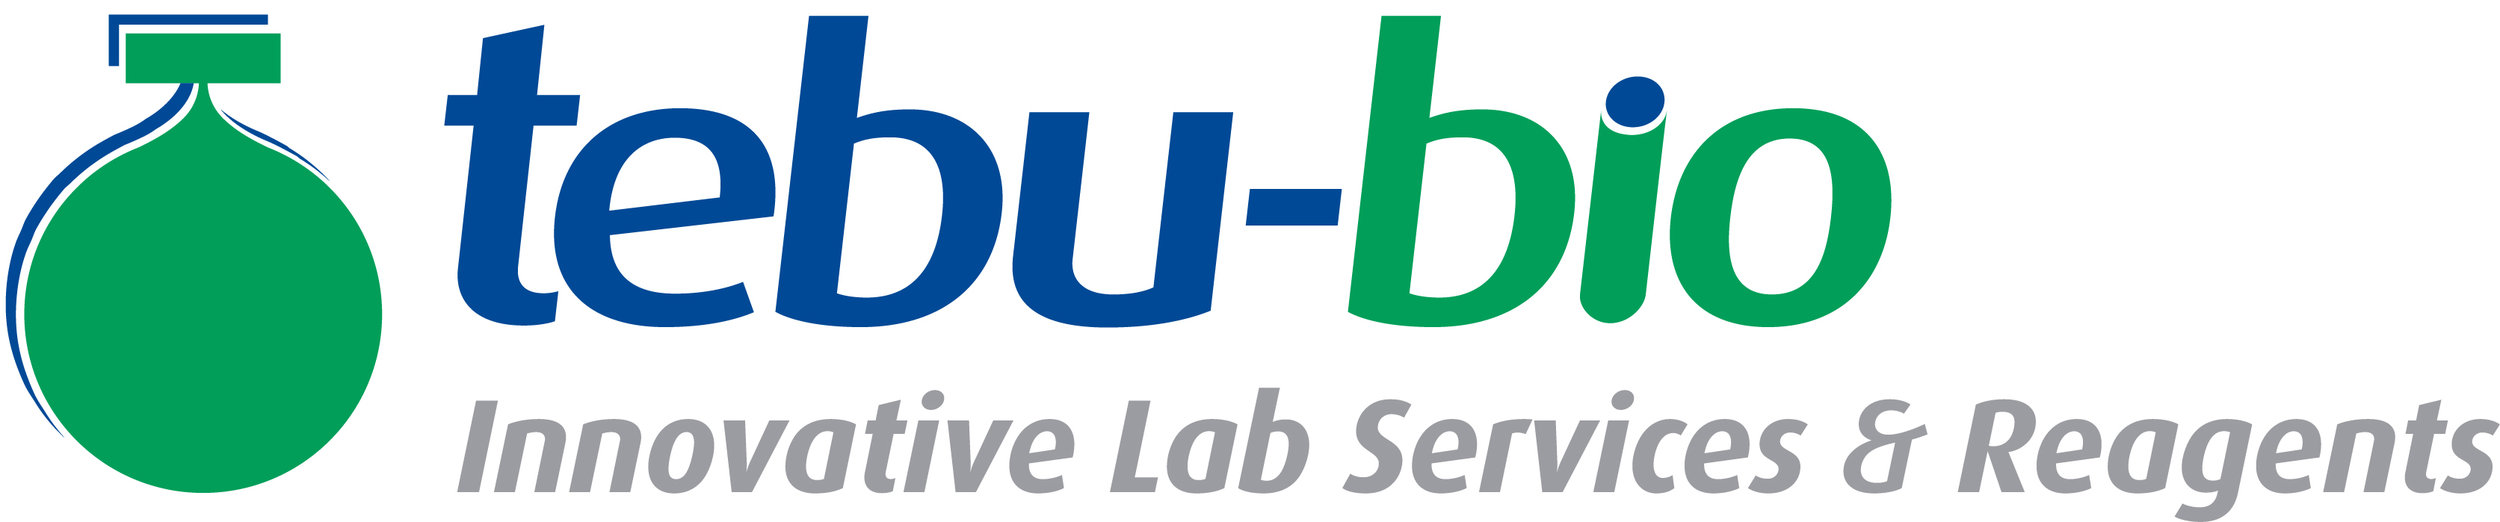 tebu-bio Netherlands - Stationsplein 99 Unit 1671703 WE HeerhugowaardNetherlandsTel: +31 072-572 21 00Fax: +31 072-572 21 33Website: www.tebu-bio.com